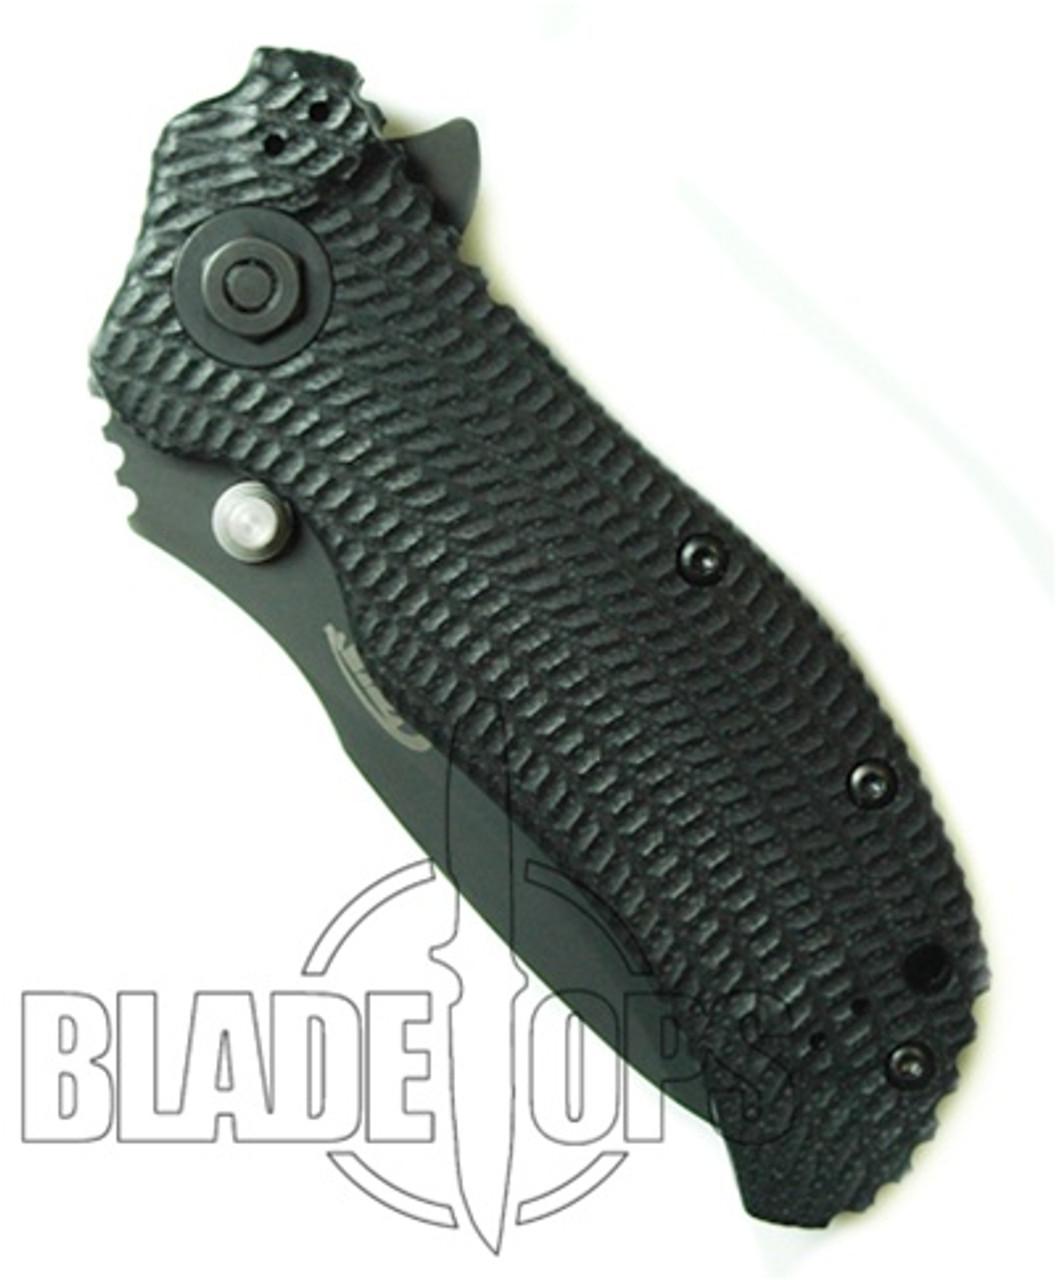 Zero Tolerance 0300 Spring Assist Knife, S30V Tactical Plain Blade, Black G10 and Titanium Handles